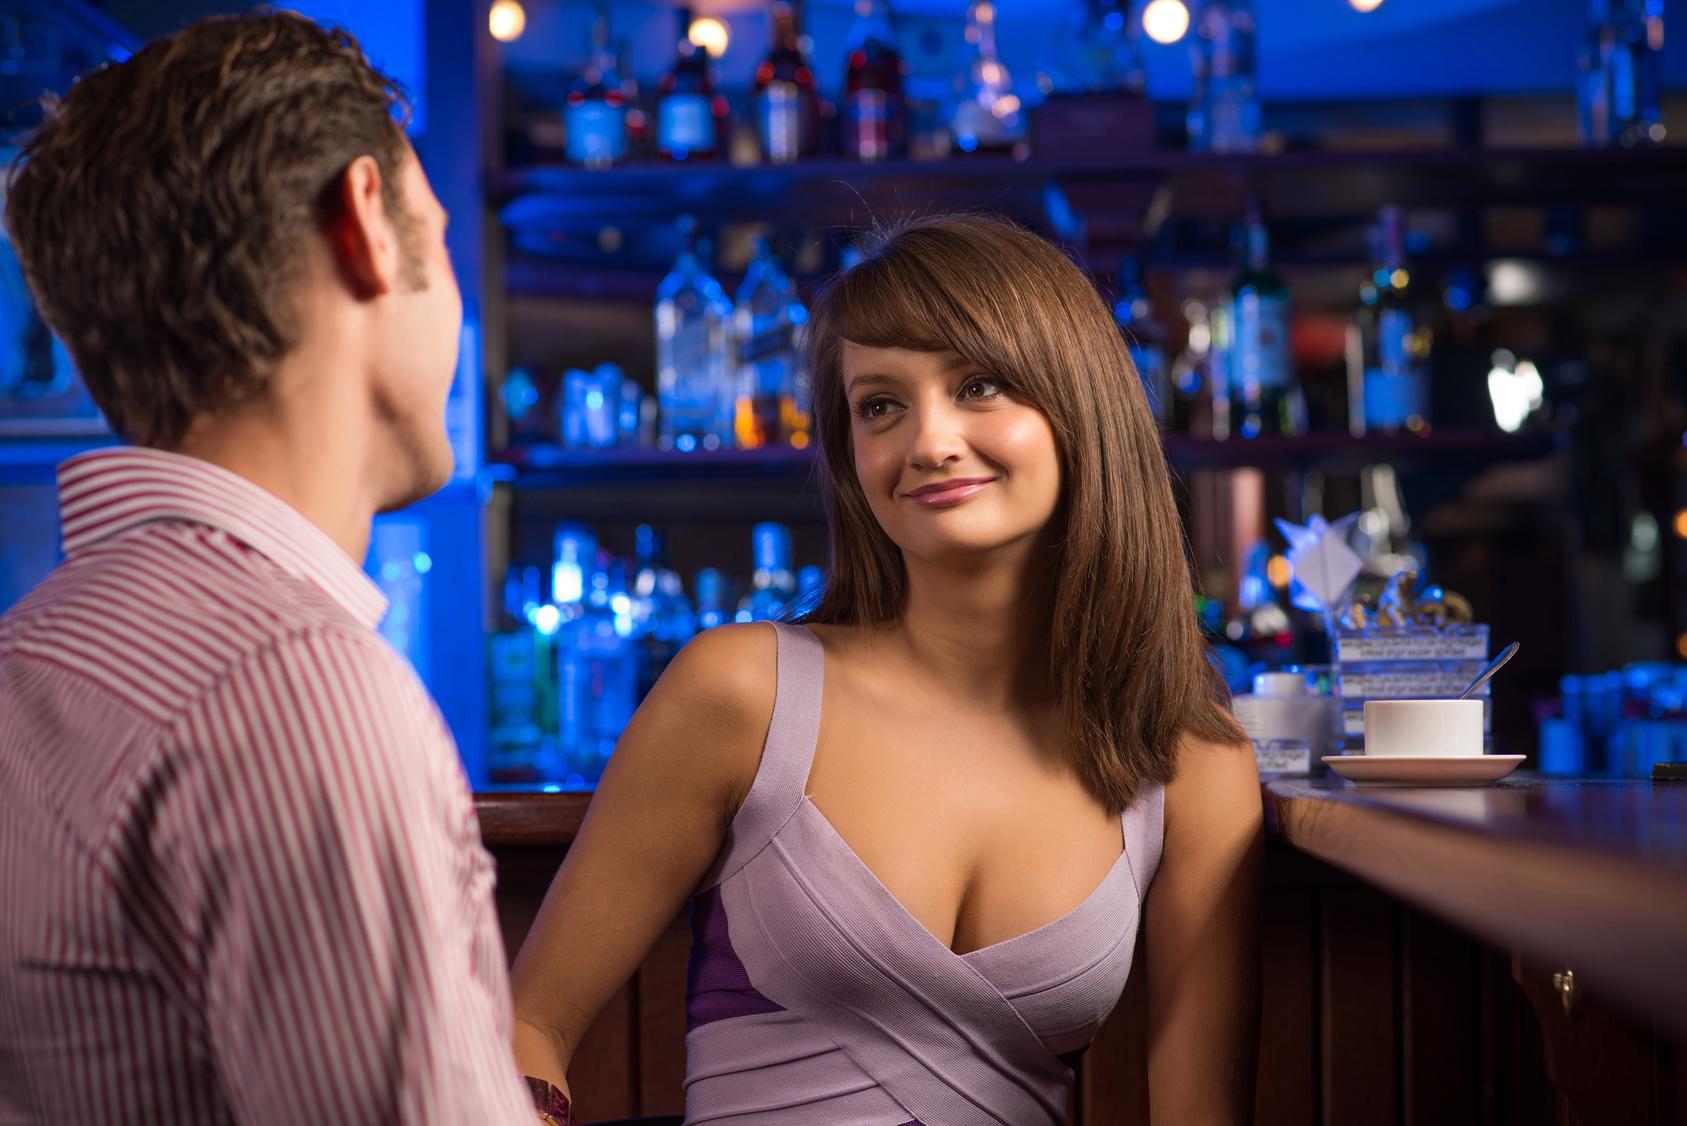 latino match dating site